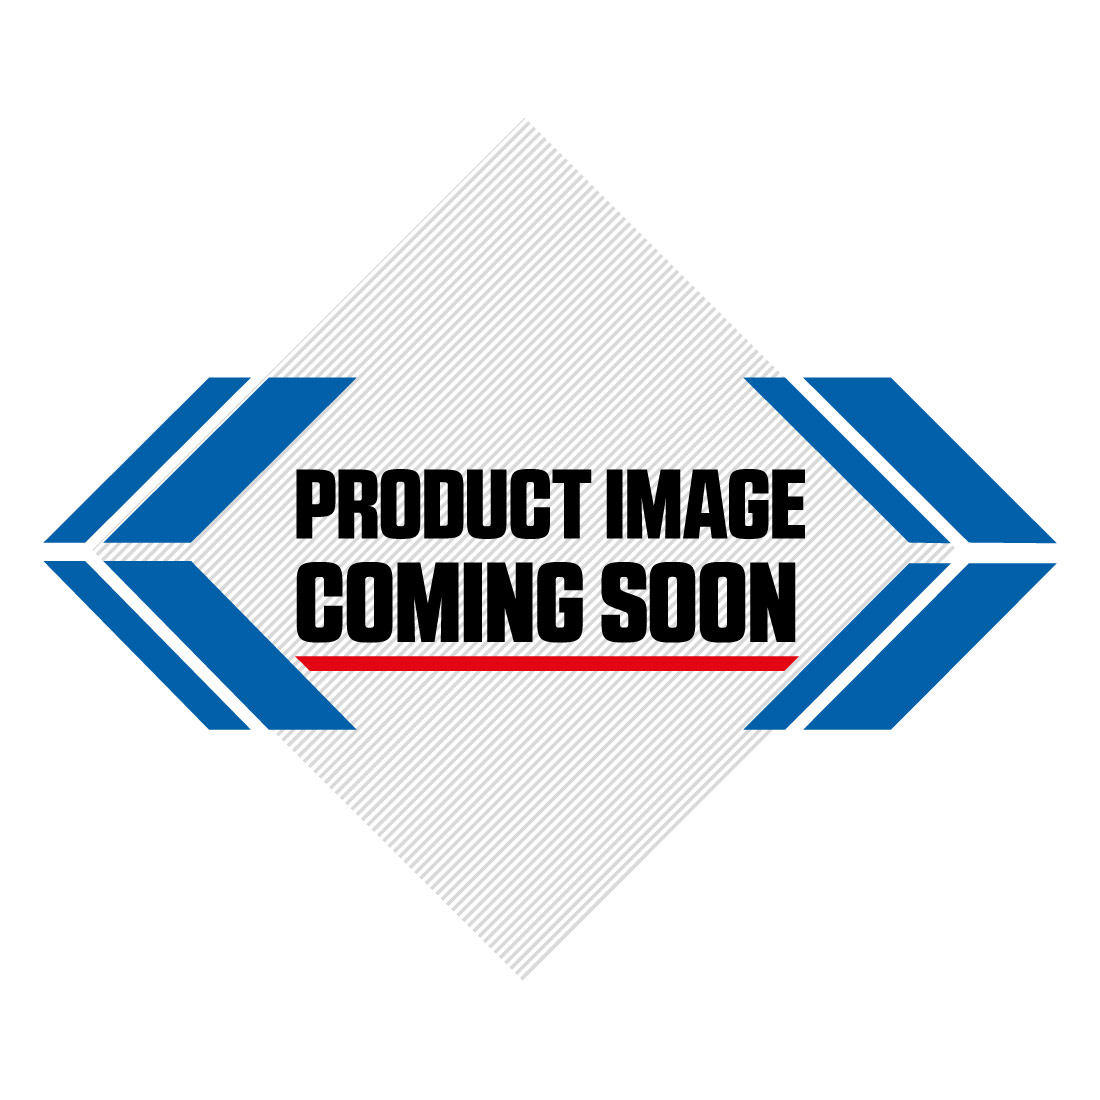 MDR Fork Seals XR 250 (86-ON) KX 125 (90) 250 500 (89-90) RM 125 250 (90) YZ 125 250 (89-90)